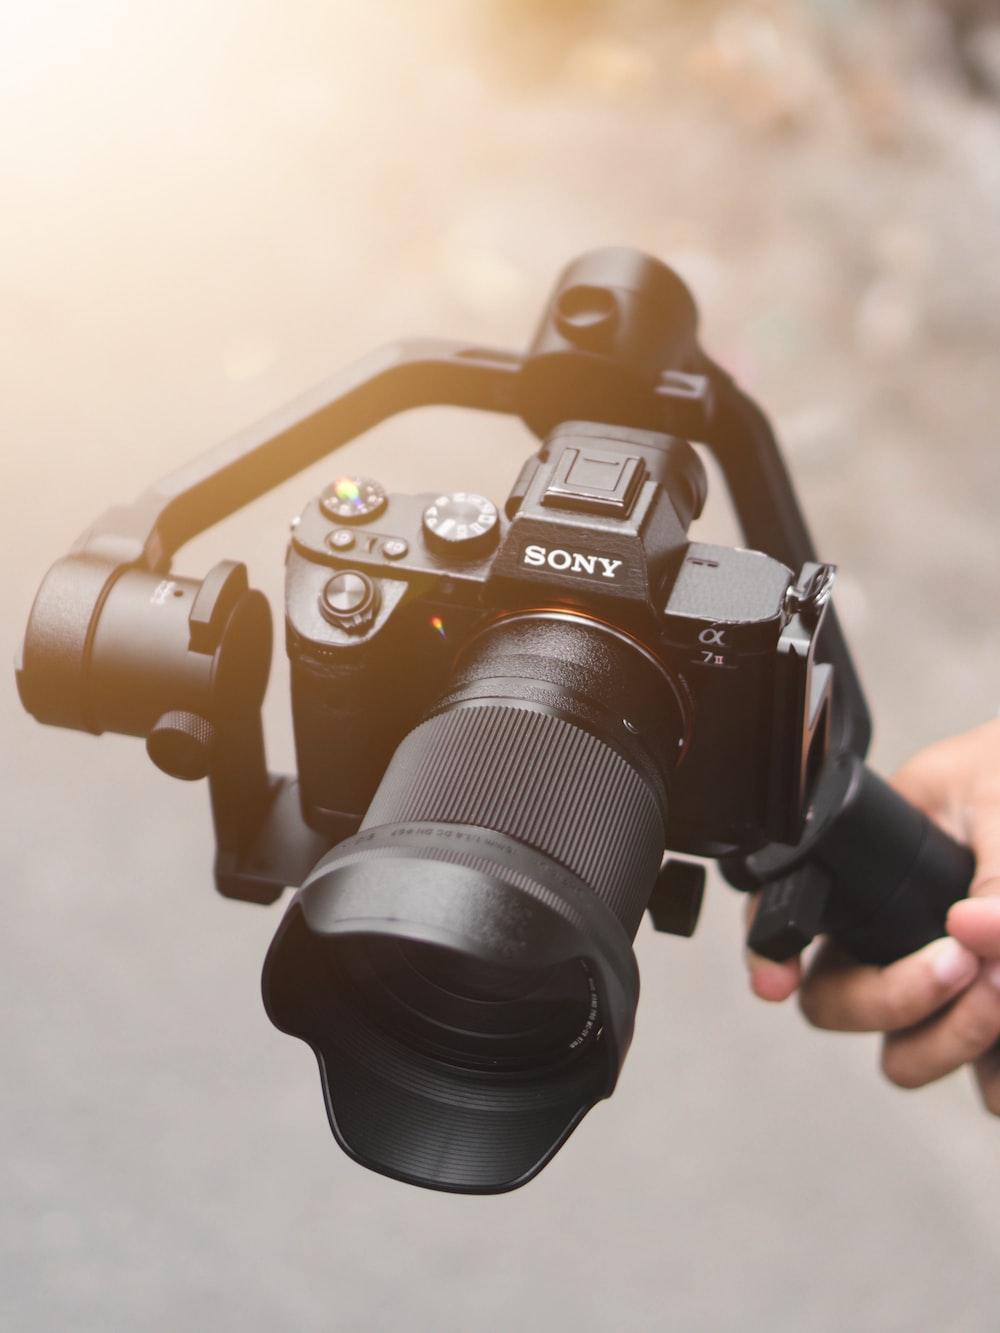 black Sony DSLR camera with stabilizer